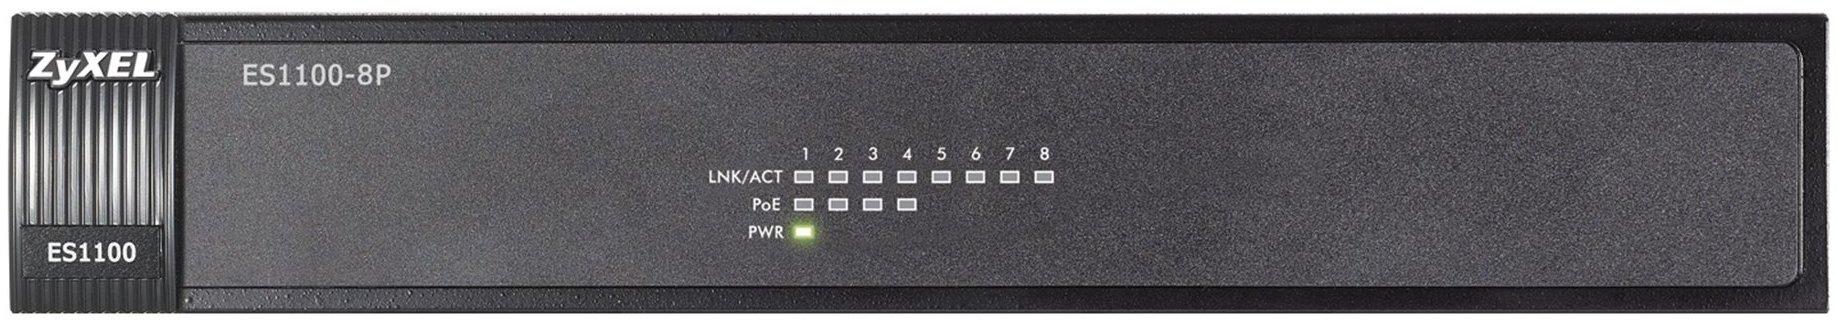 ZyXEL ES1100-8P 8-port 10/100 Ethernet switch